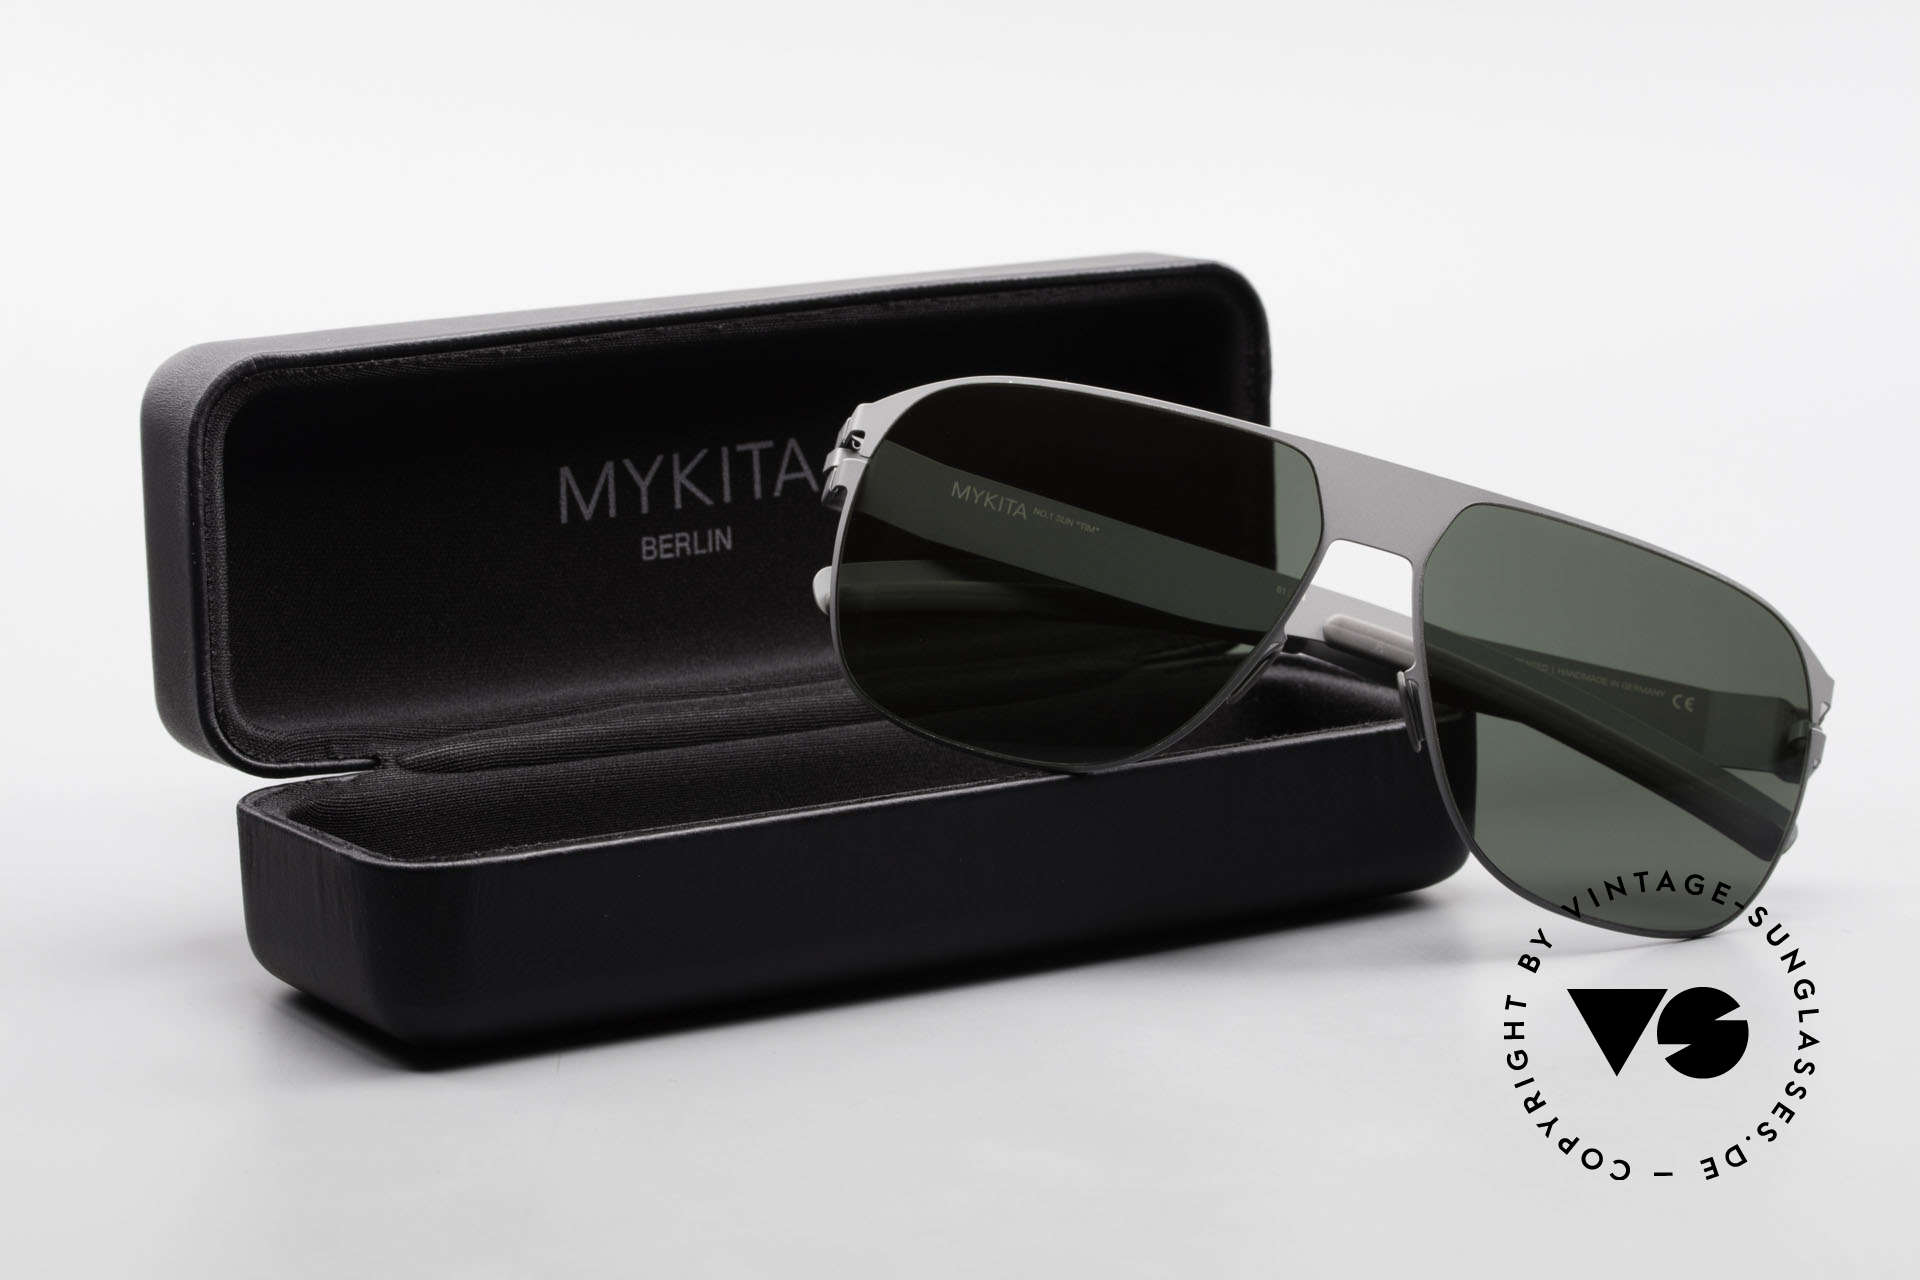 Mykita Tim Mykita Shades Vintage 2011's, Size: medium, Made for Men